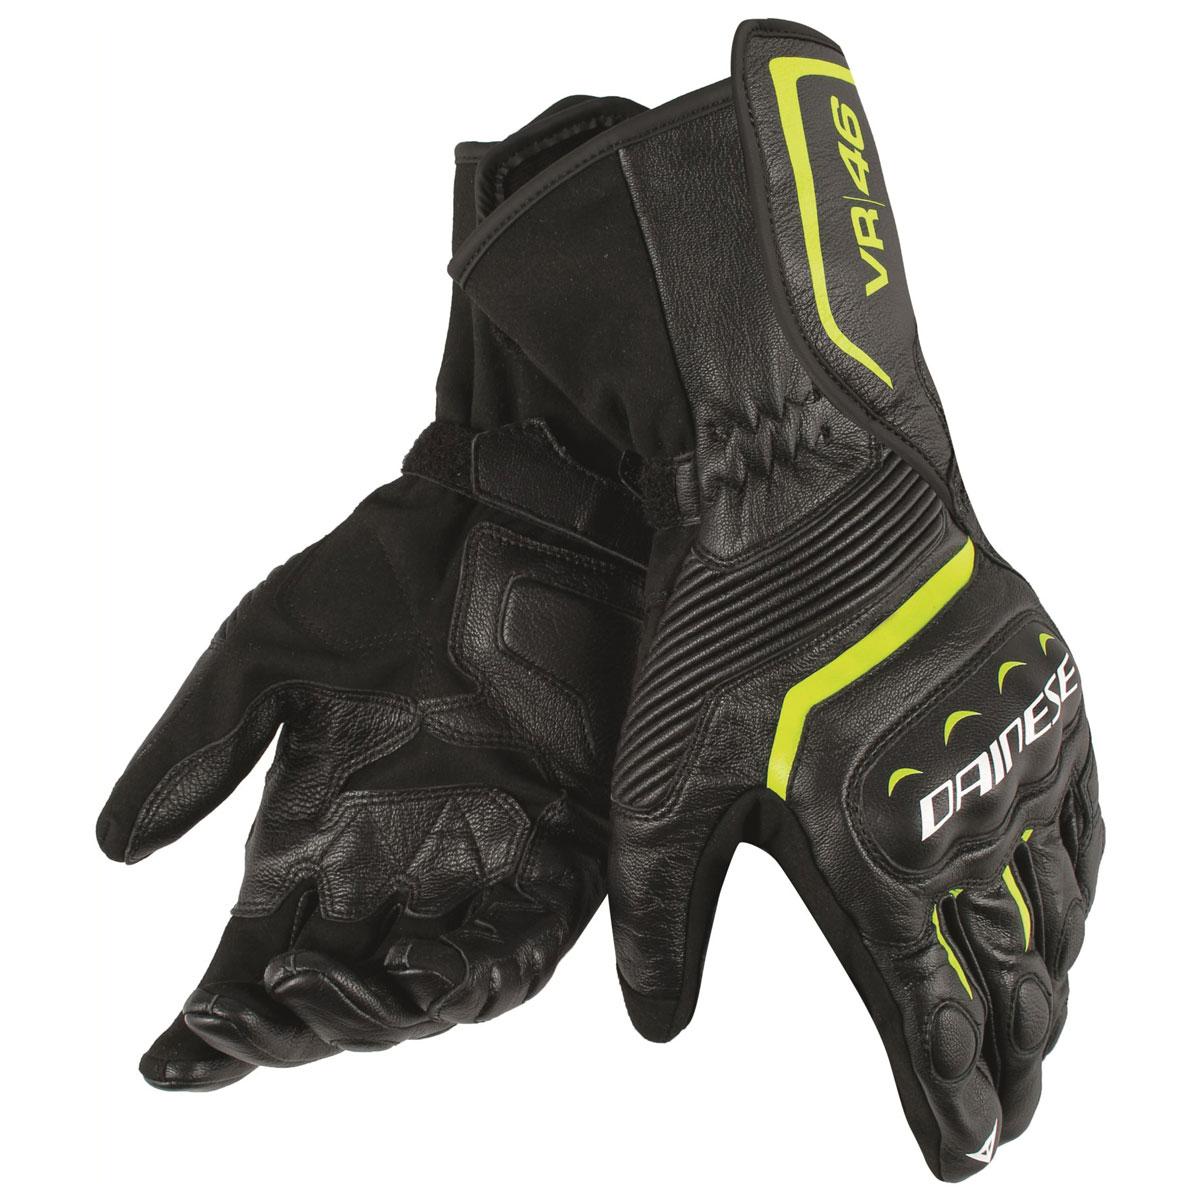 Dainese Men's VR46 Assen Black/Fluorescent Yellow Leather Gloves